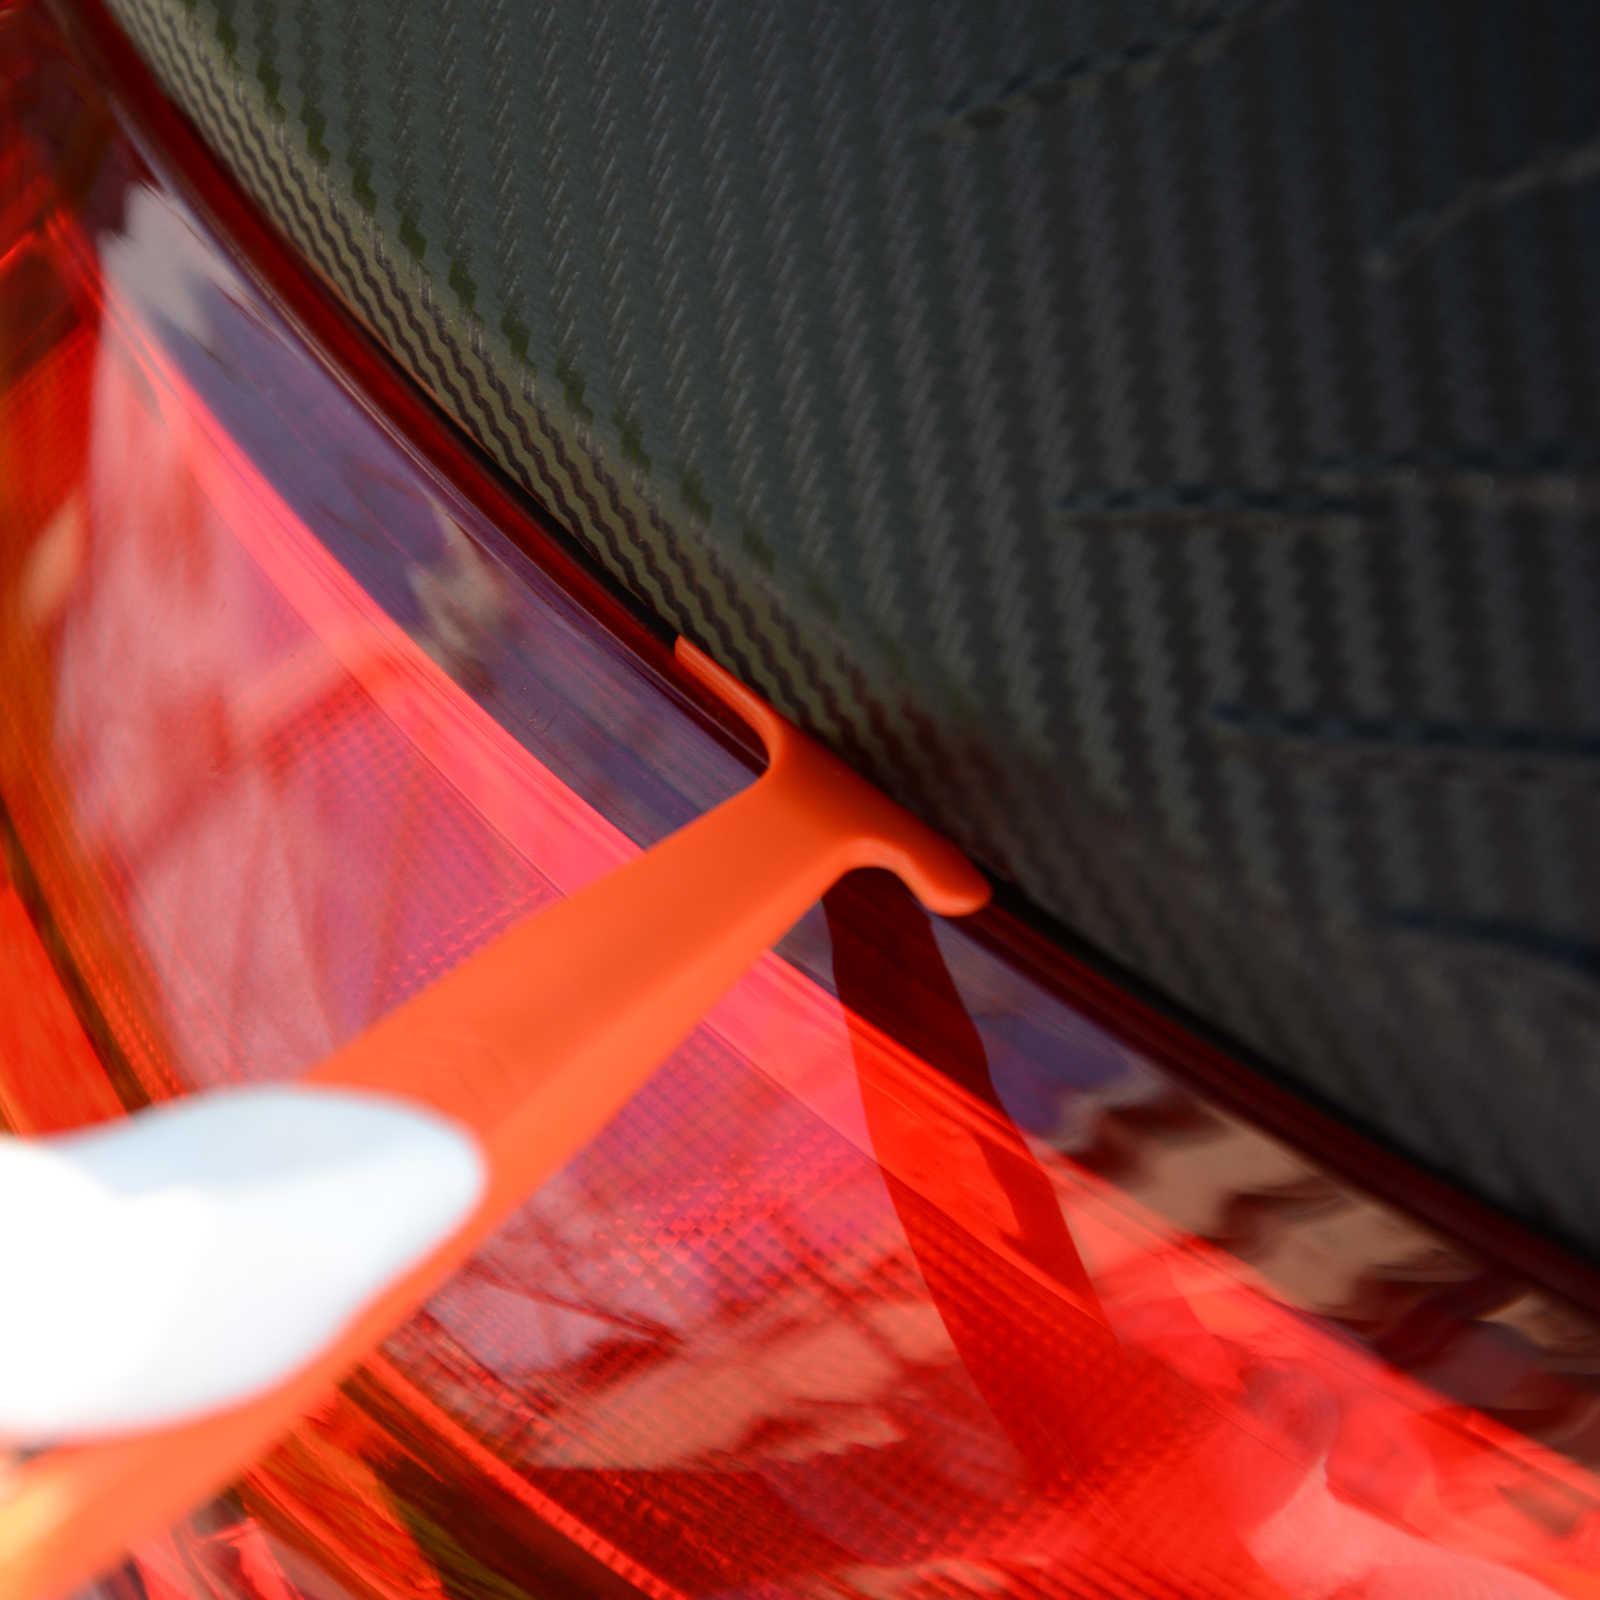 EHDIS カーボンビニール車磁気ステッカースキージフィルム 3 硬度 Wrapstick スクレーパー窓色合いクリーニング自動車の付属品